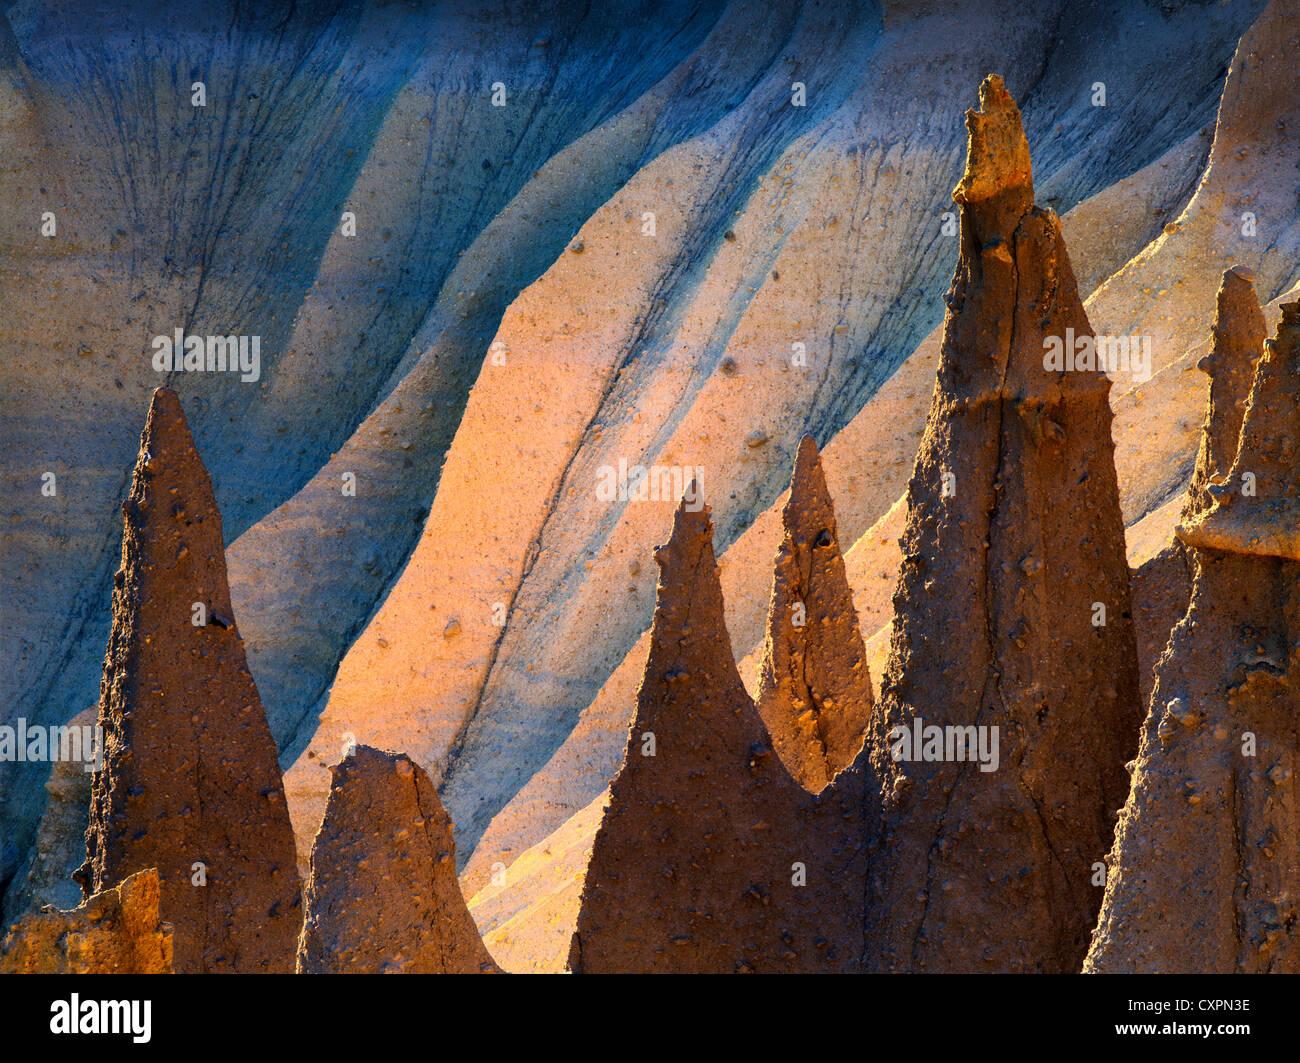 Hinterleuchtete Pinnacles Cater Lake Nationalpark, Oregon vulkanischen Ursprungs Stockfoto